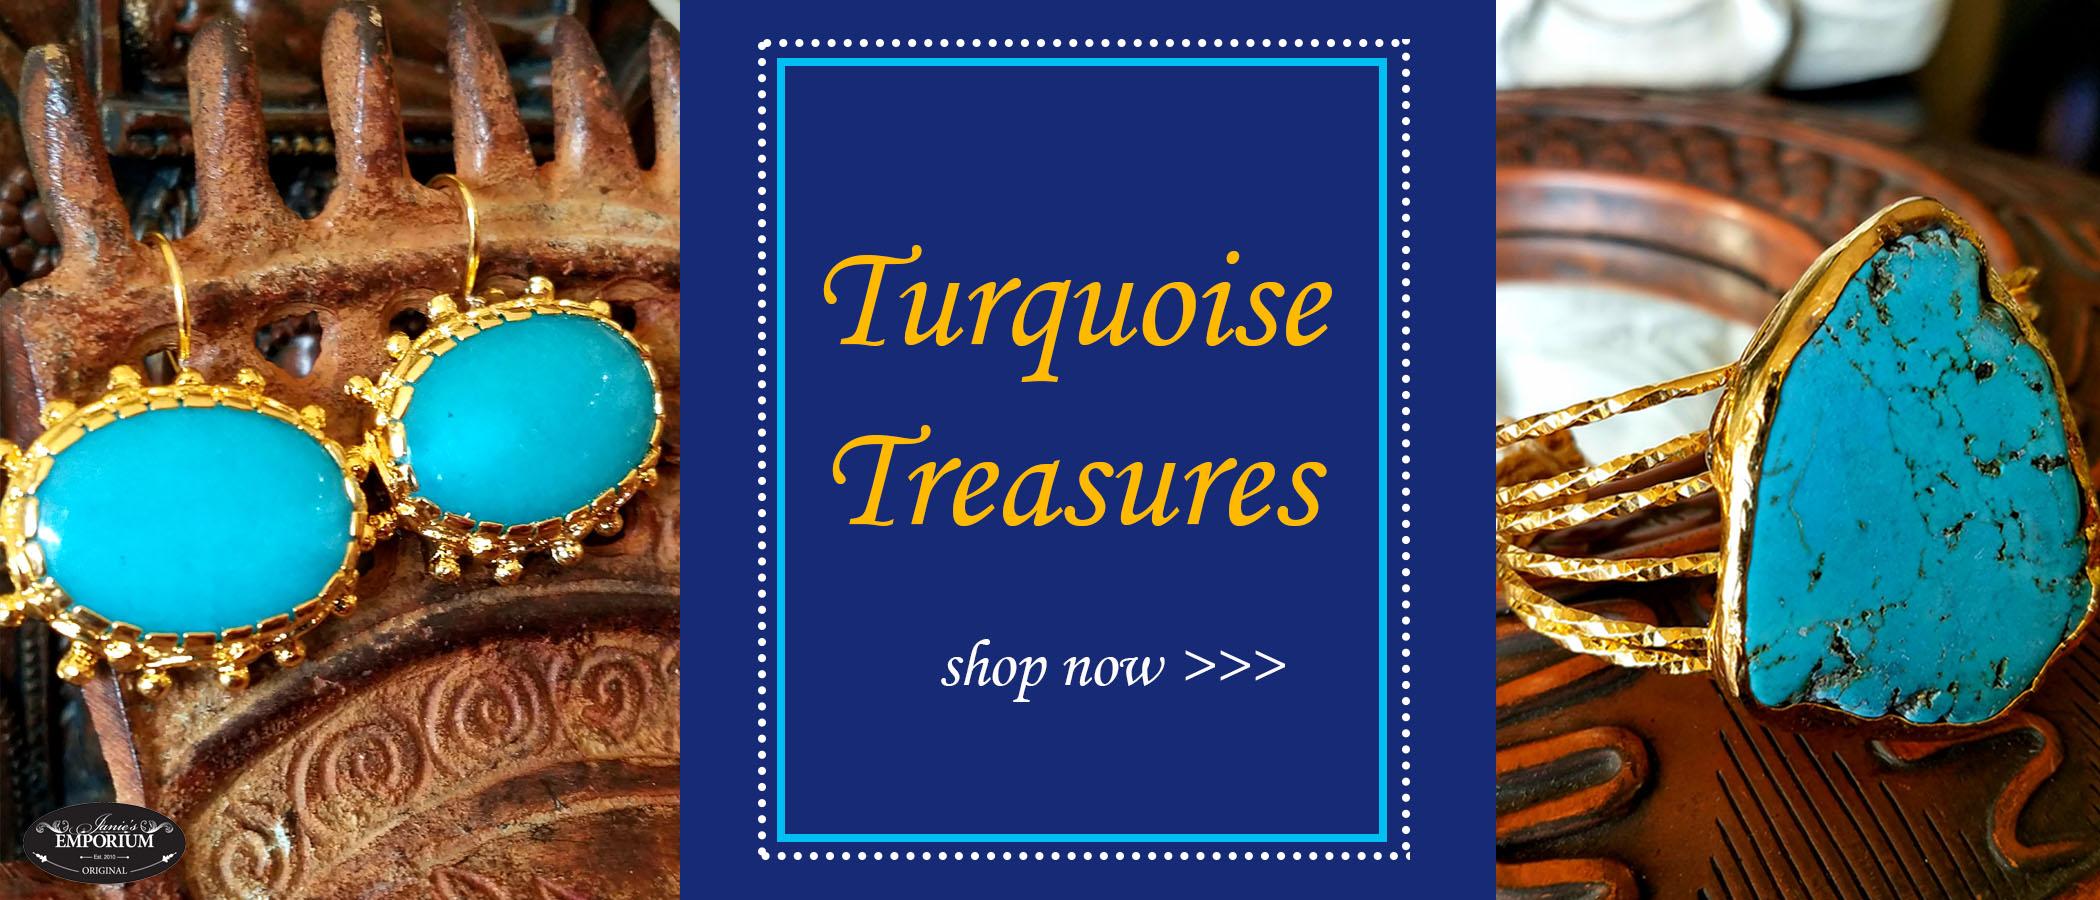 turquoise treasures.jpg